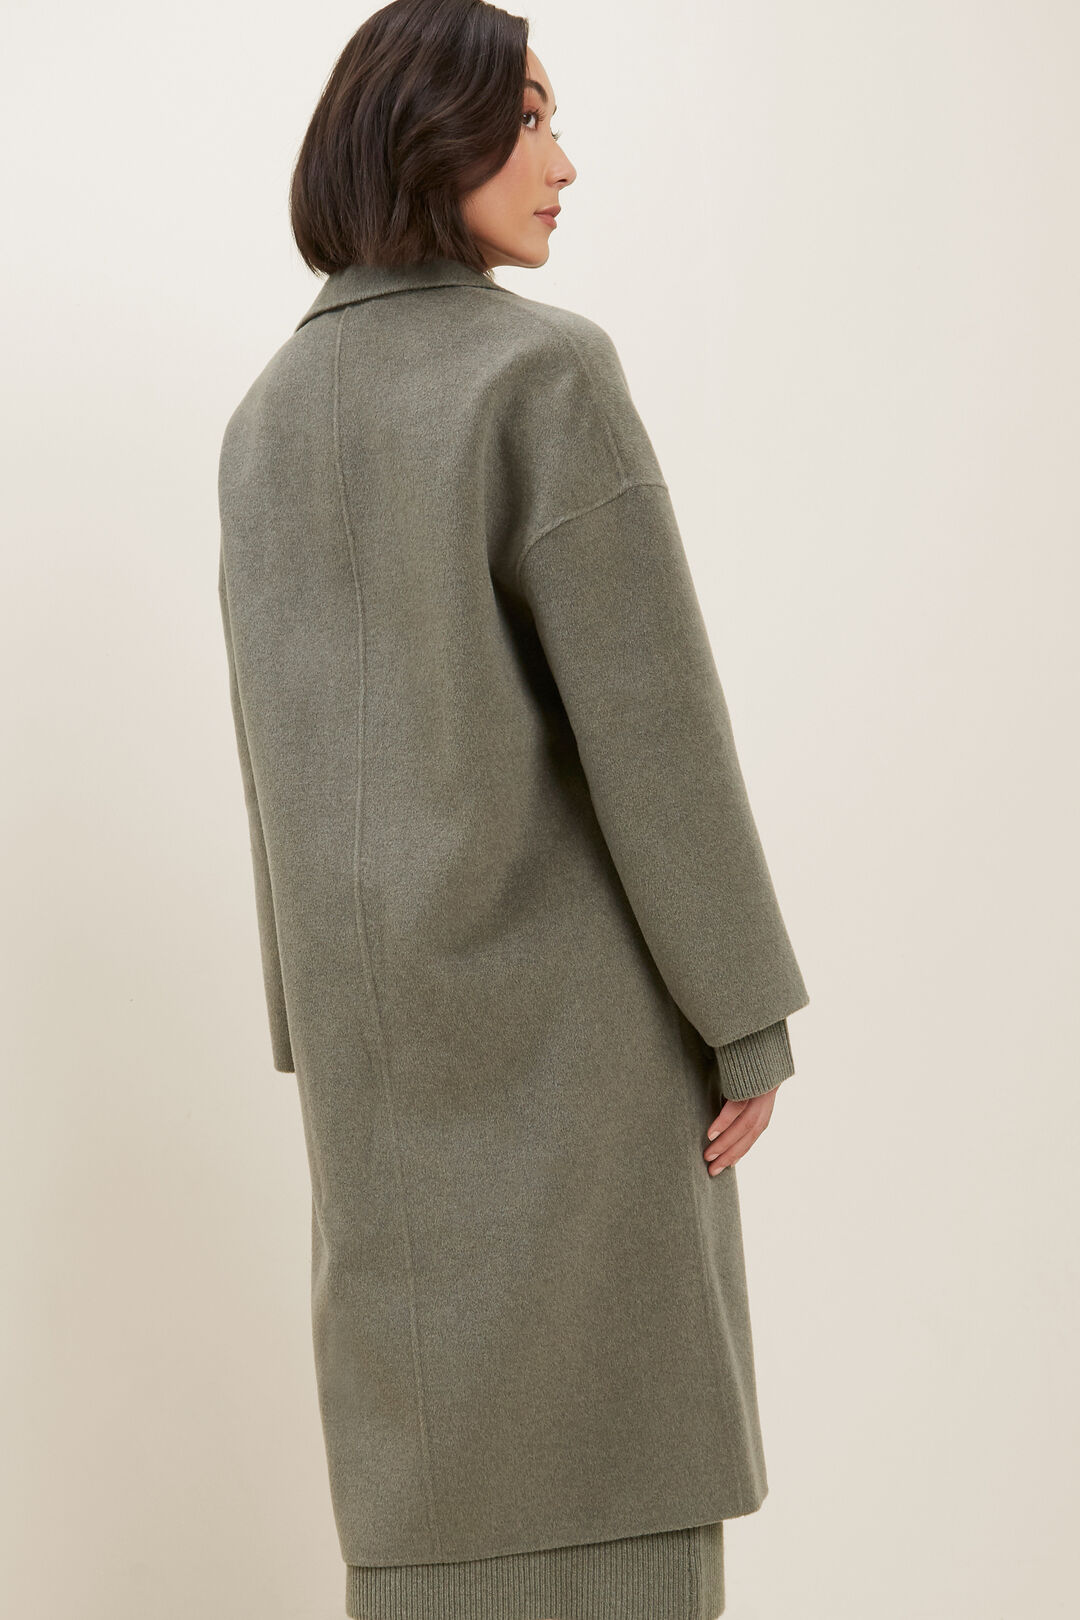 Wool Boyfriend Coat  Olive Khaki Marle  hi-res